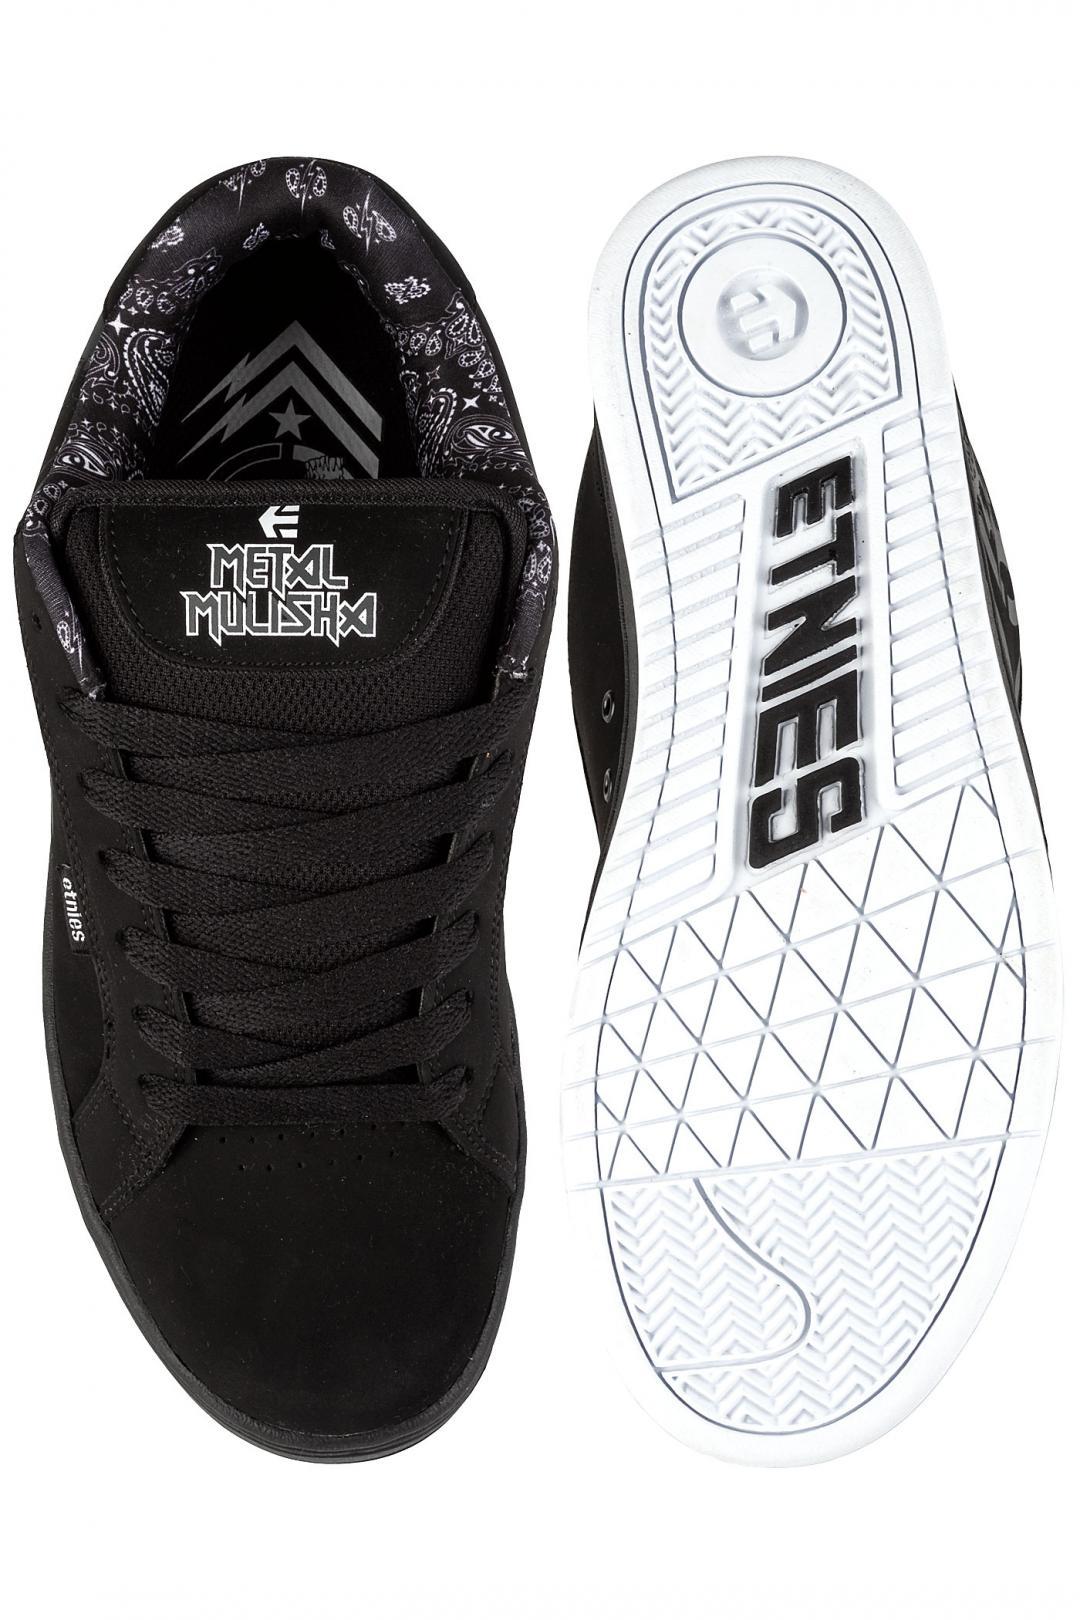 Uomo Etnies Metal Mulisha Fader black white | Scarpe da skate